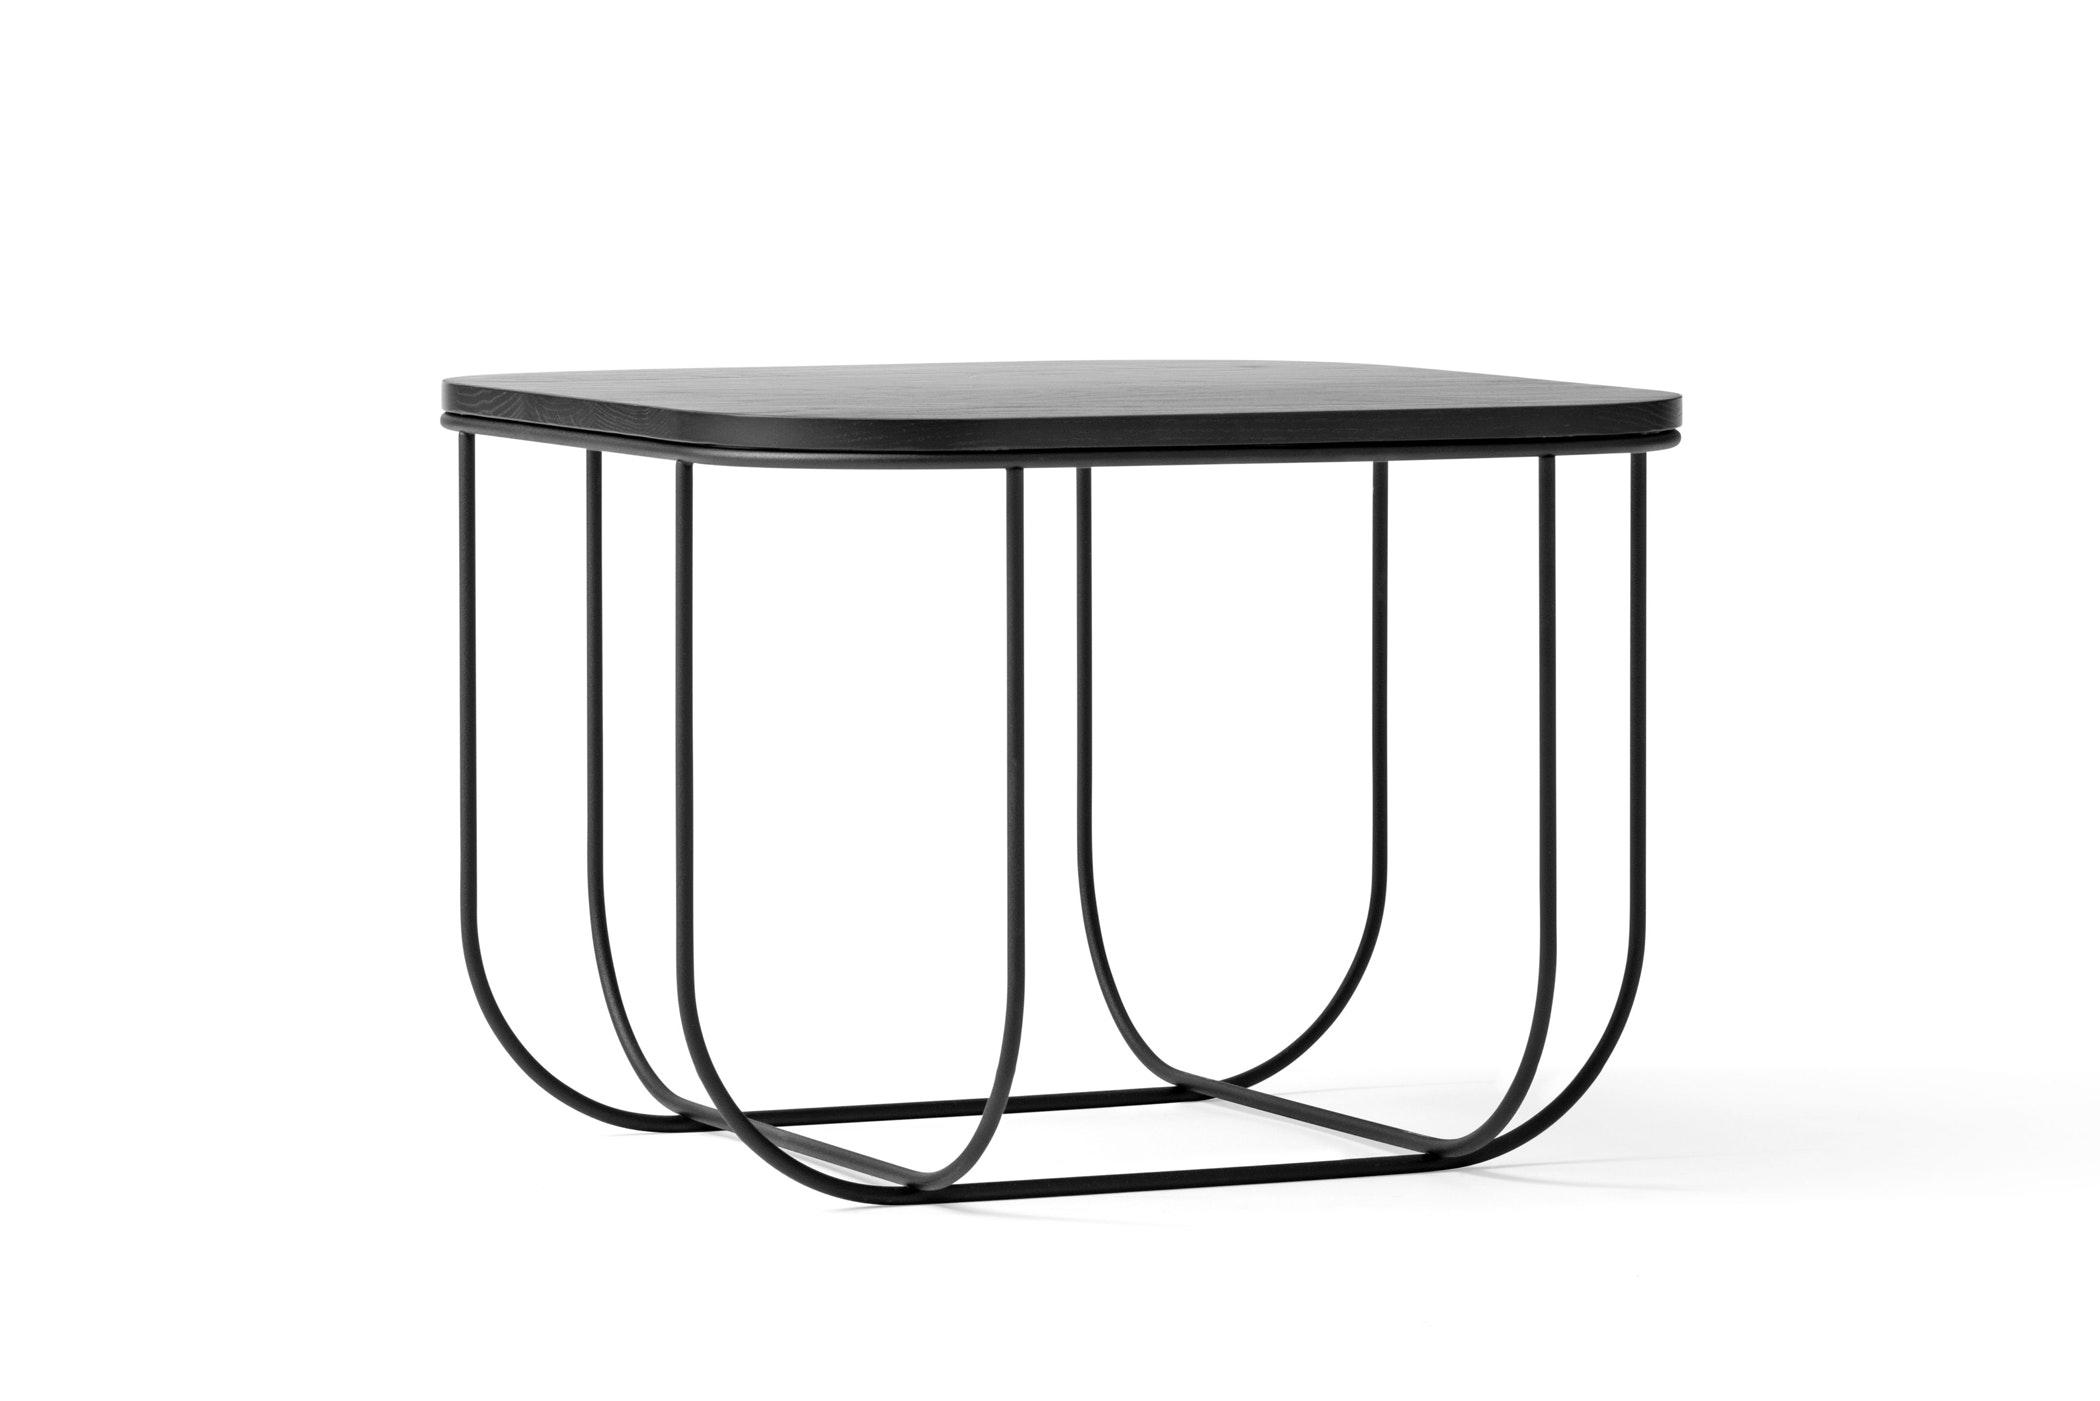 3530539 Fuwl Cage Table Black Dark Ash 02 Download 72Dpi Jpg Rgb 290537